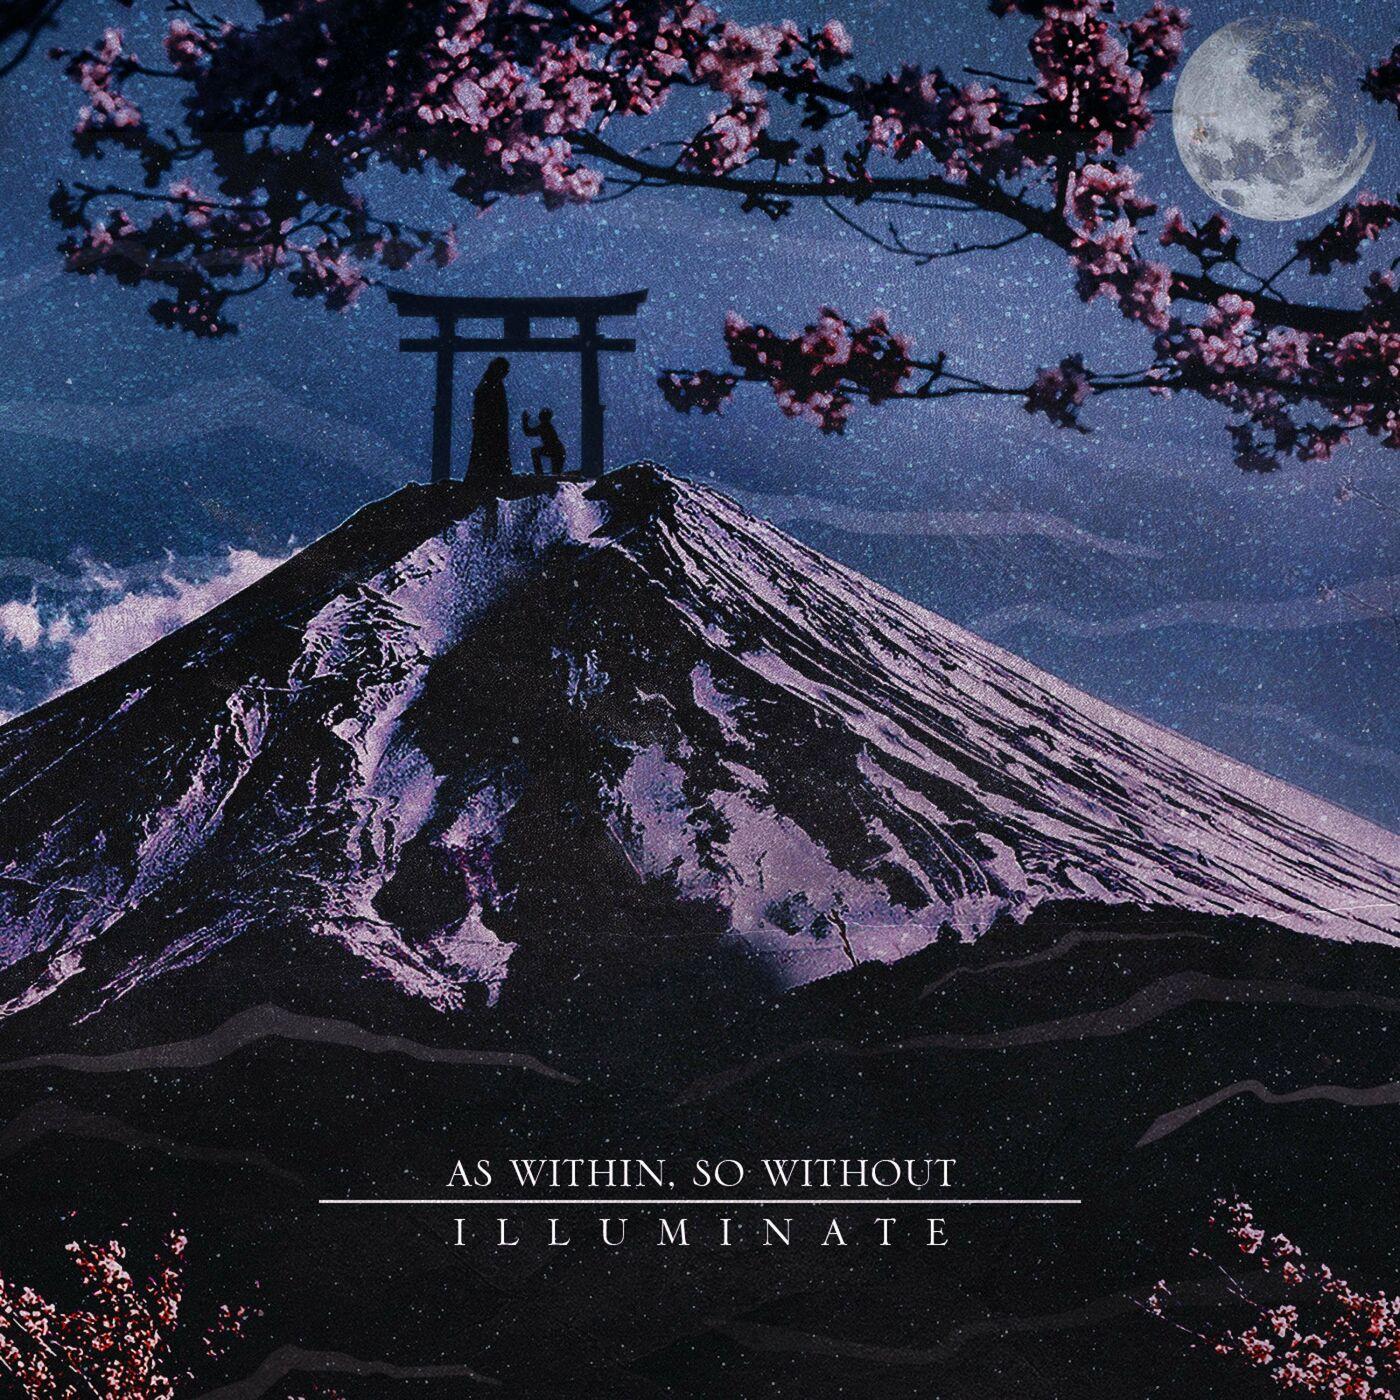 As Within, So Without - Illuminate [single] (2021)